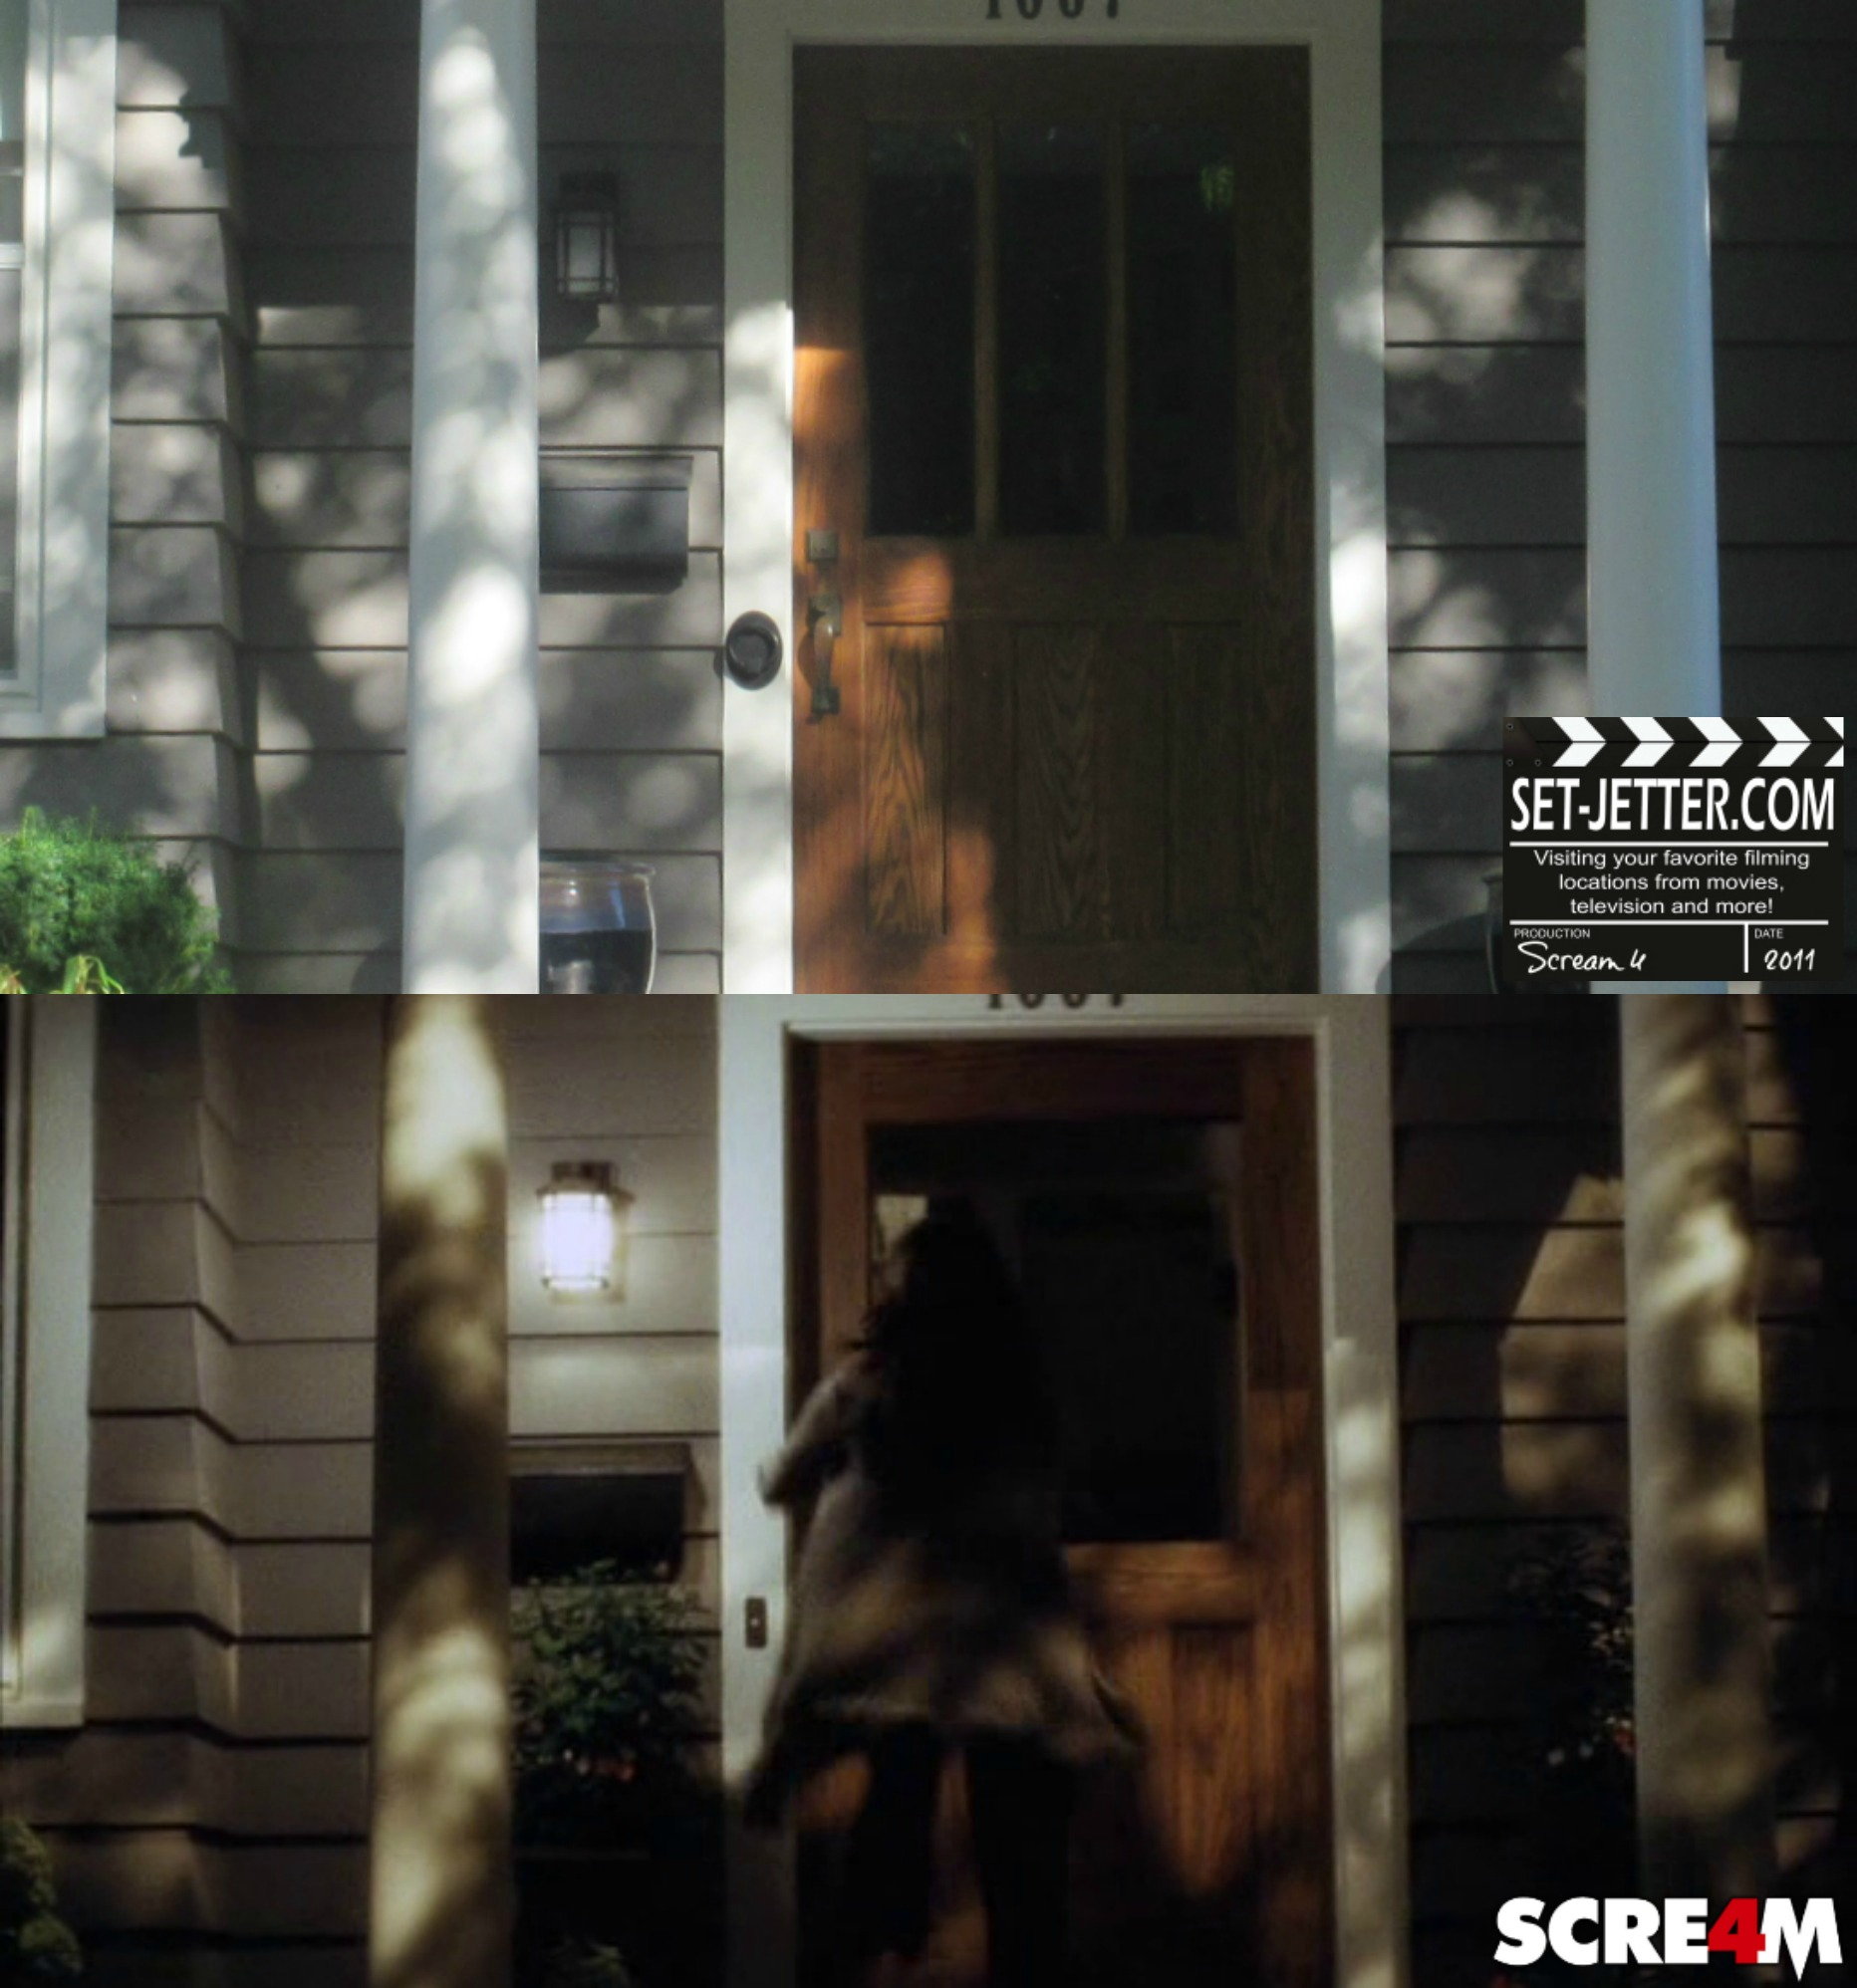 Scream4 comparison 120.jpg